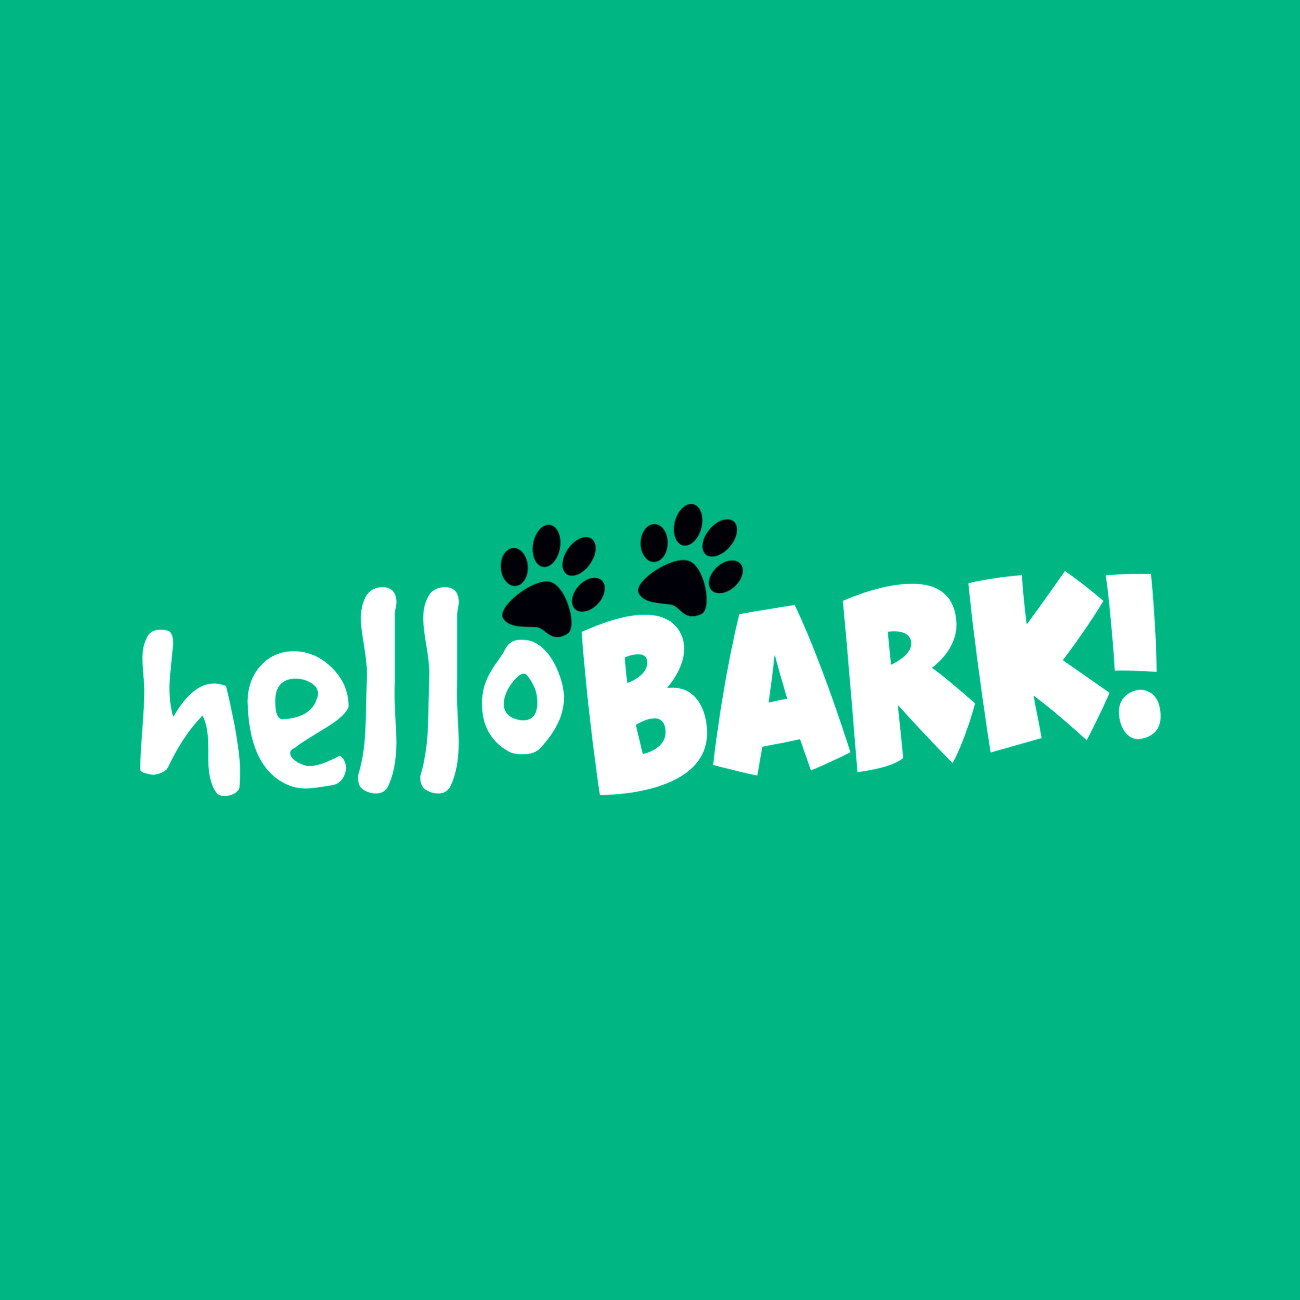 helloBARK! staff